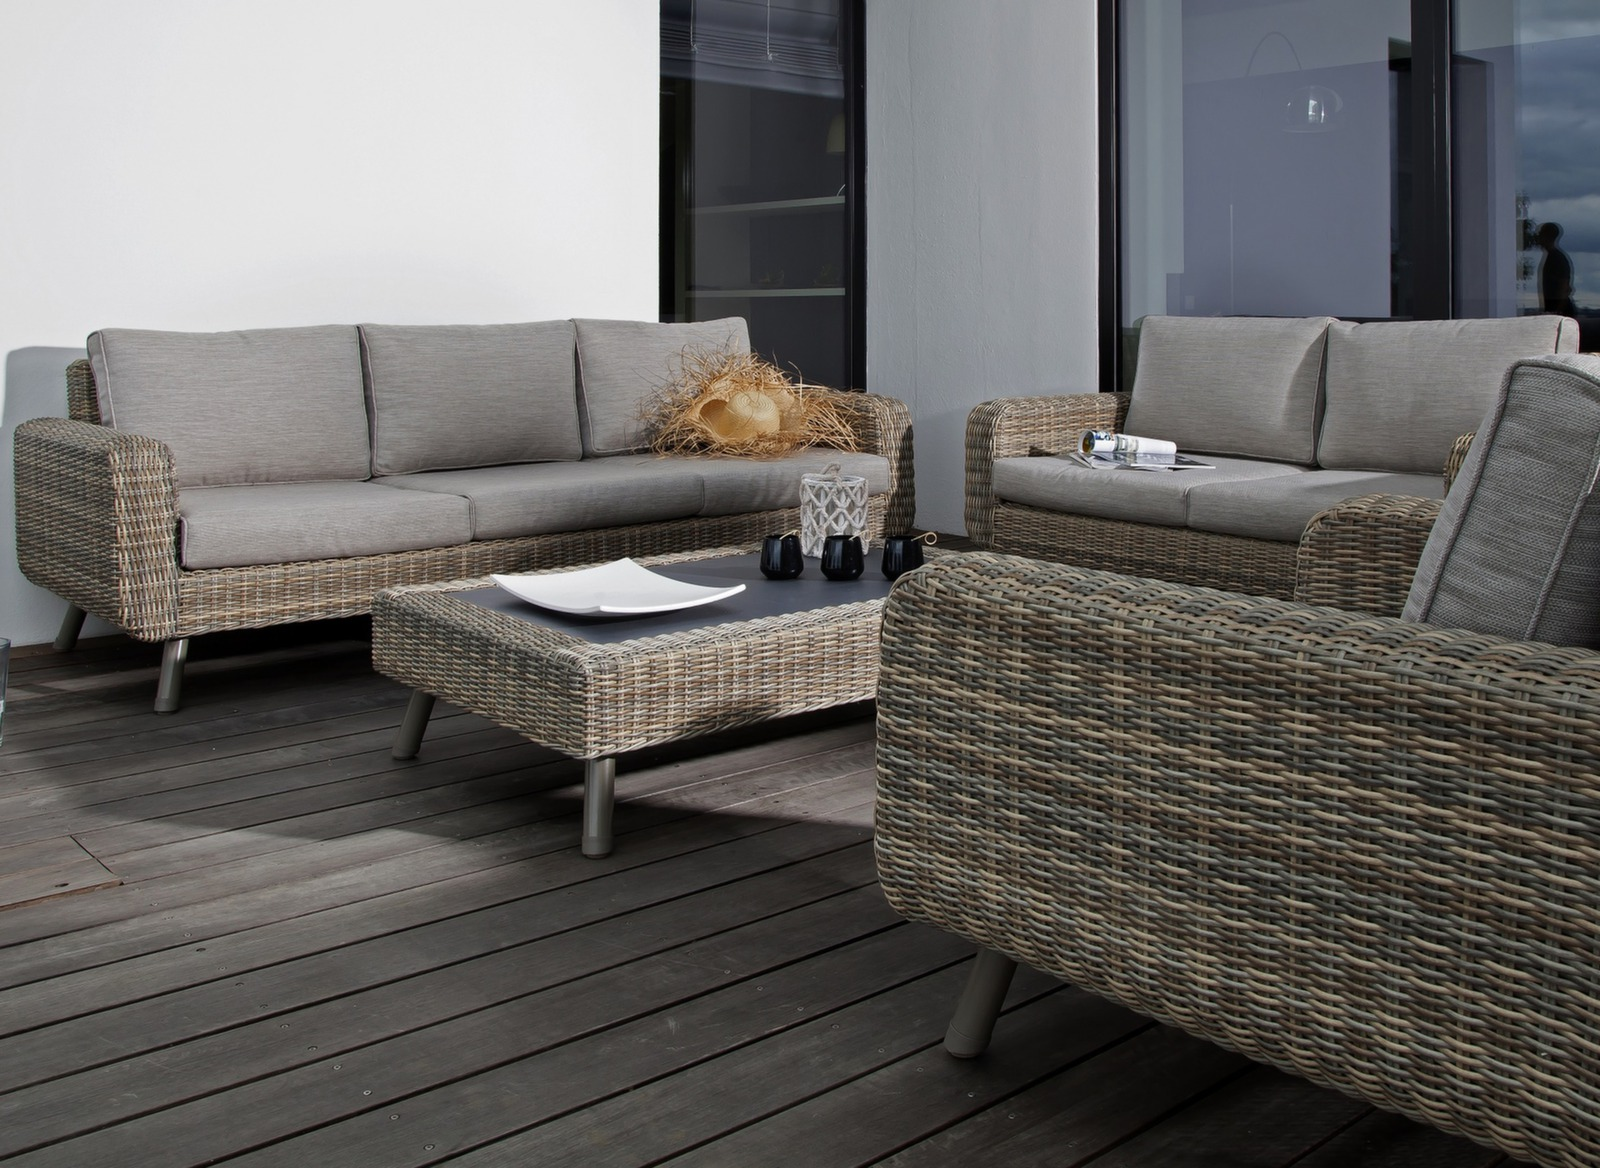 canap de jardin 3 places vigo mobilier de jardin proloisirs. Black Bedroom Furniture Sets. Home Design Ideas